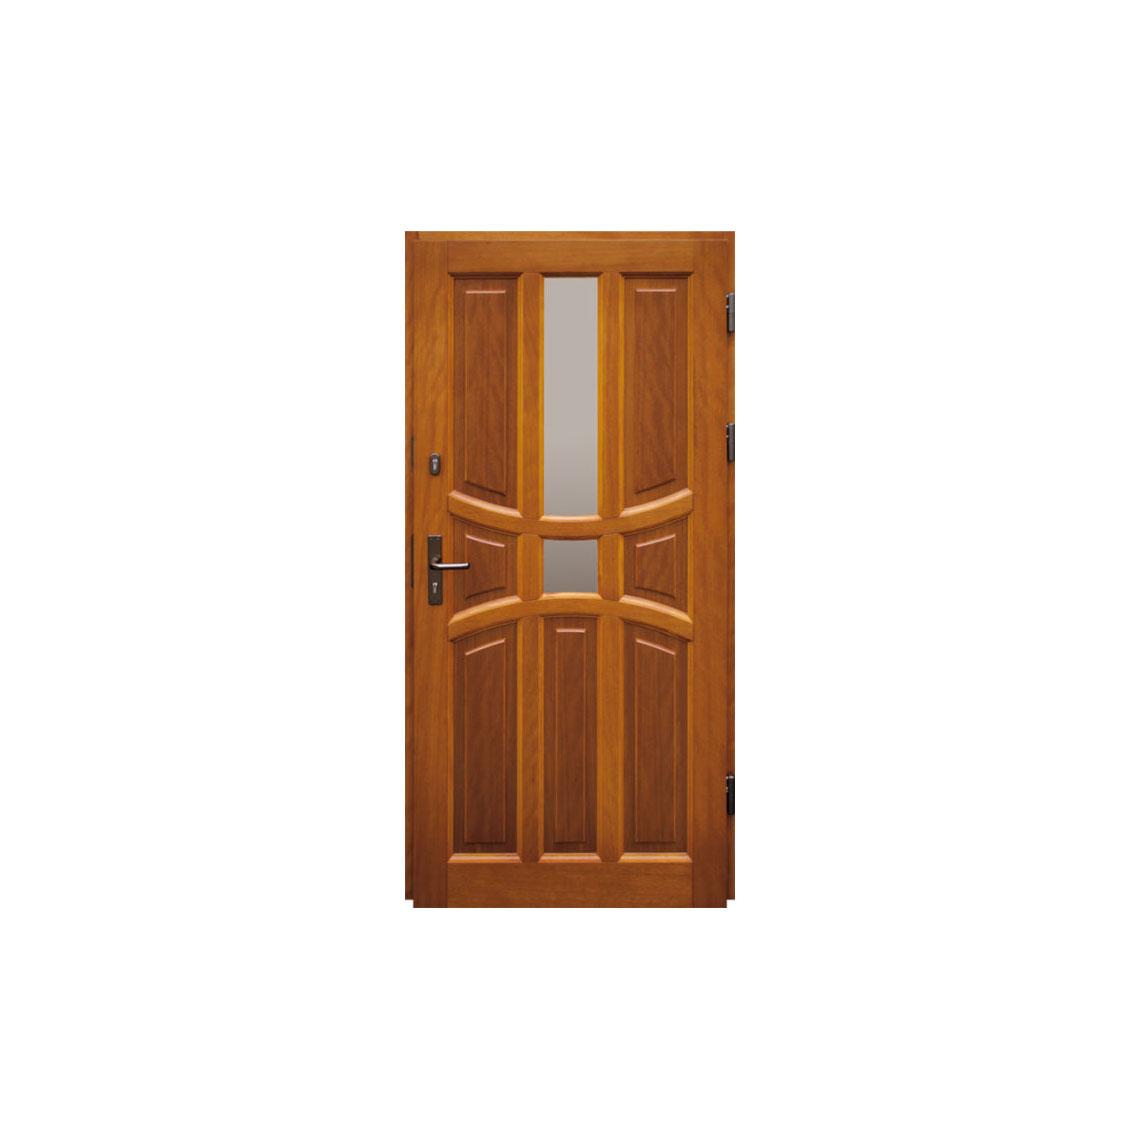 Koka durvis WD-15